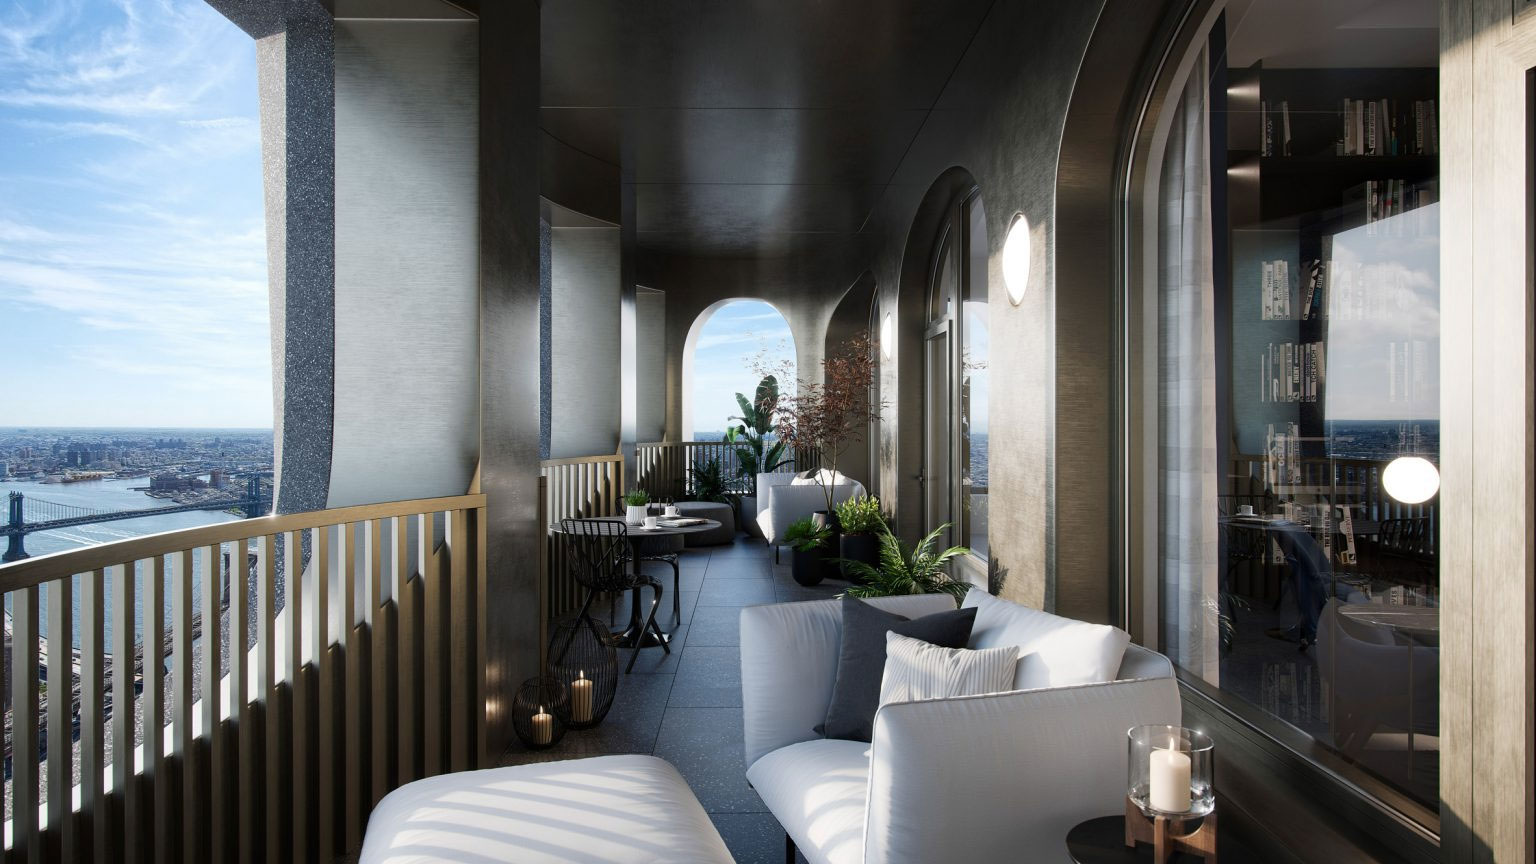 Sir David Adjaye partners with Aston Martin on five lavish NY apartments